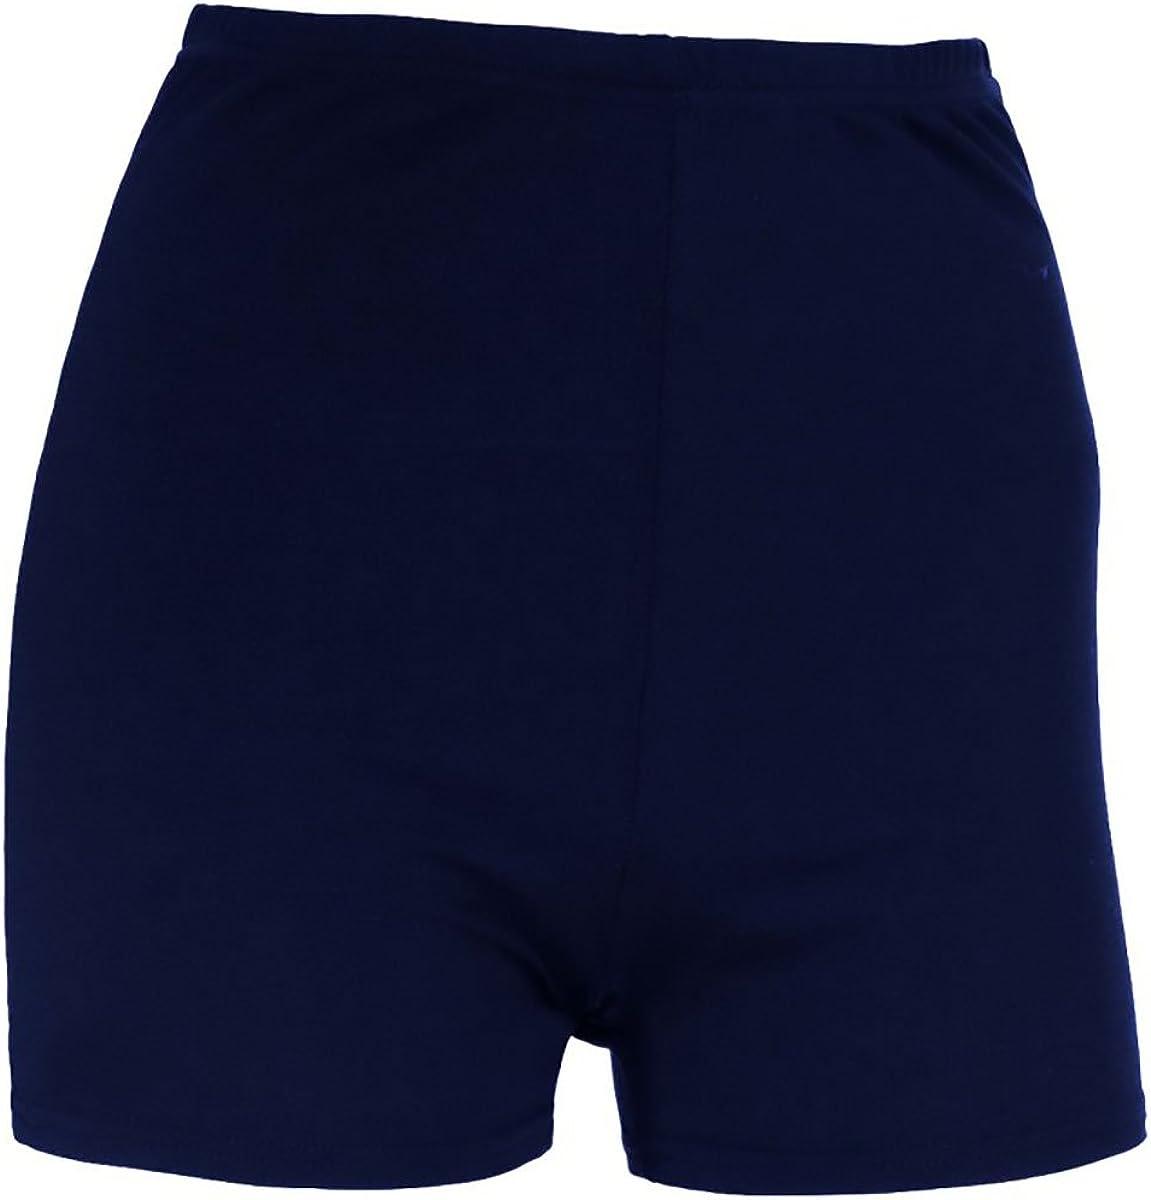 GIMER Pantaloncino PALLAVOLO Unisex Acc Volley